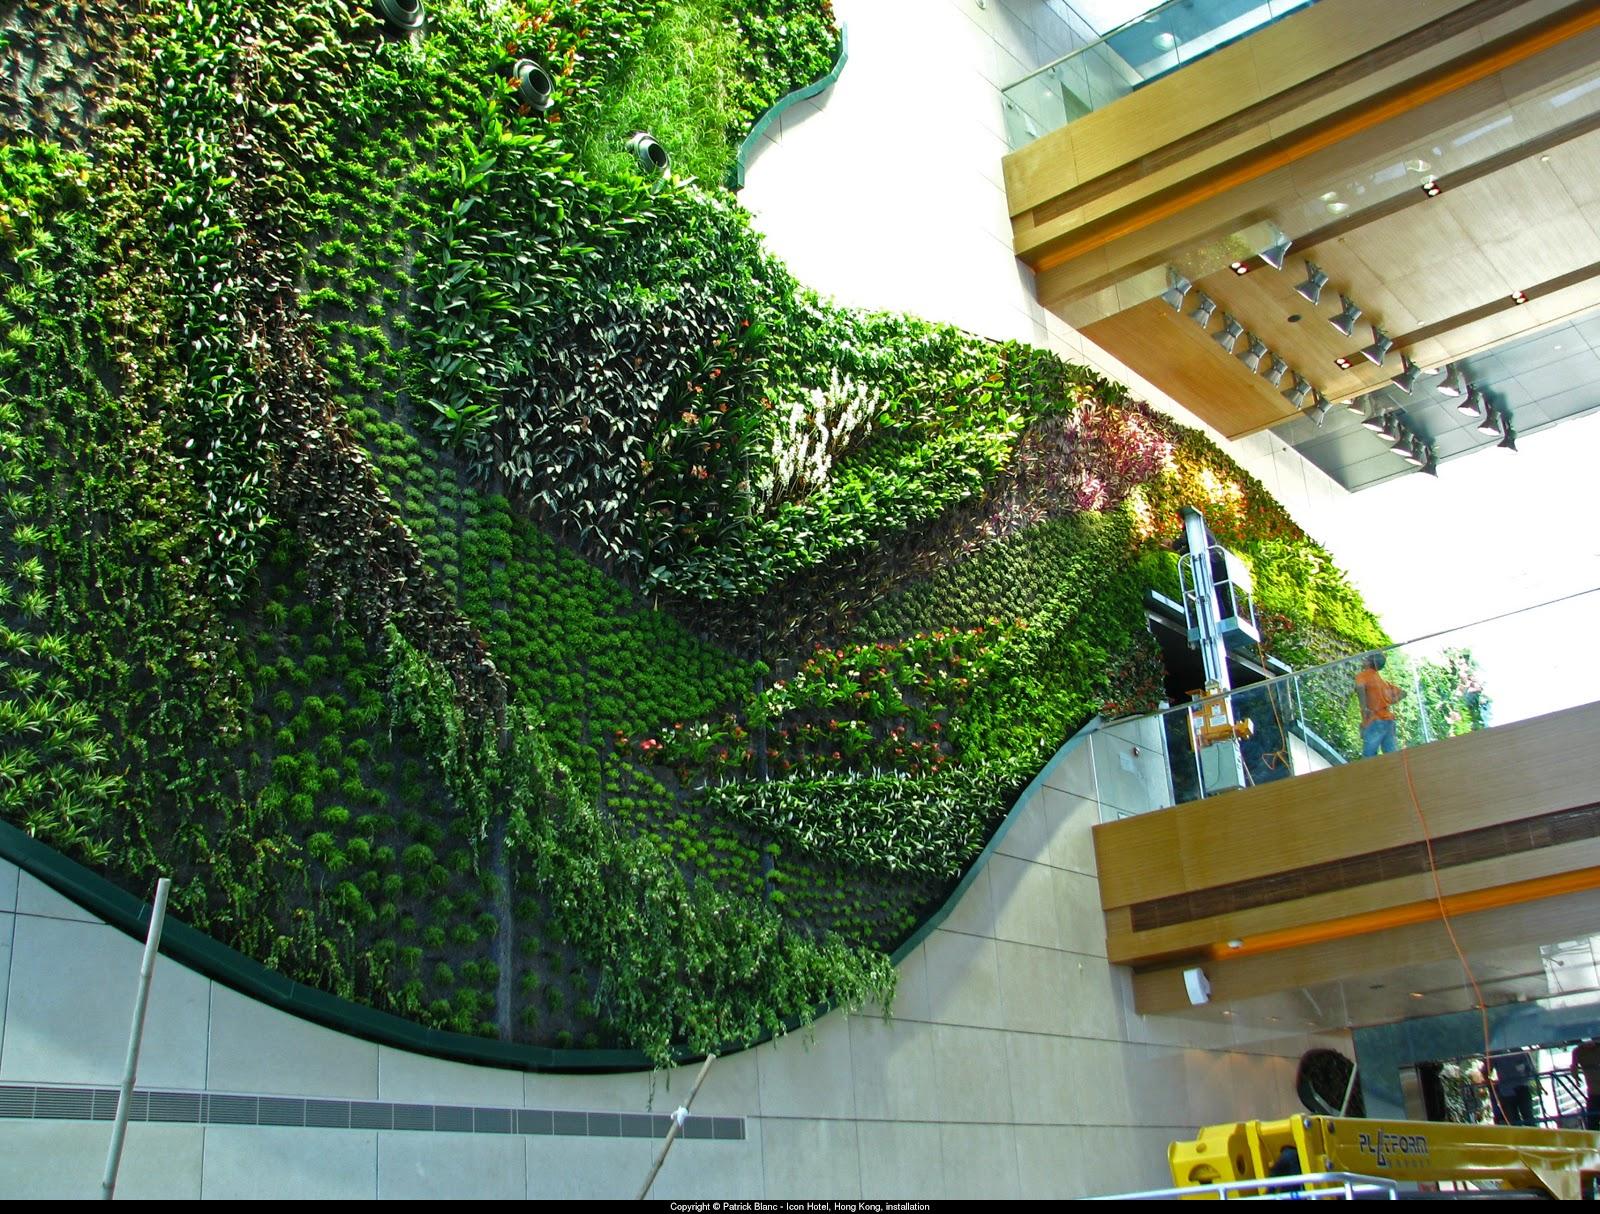 Dcorandobyalba jardines verticales - Jardines verticales interiores ...